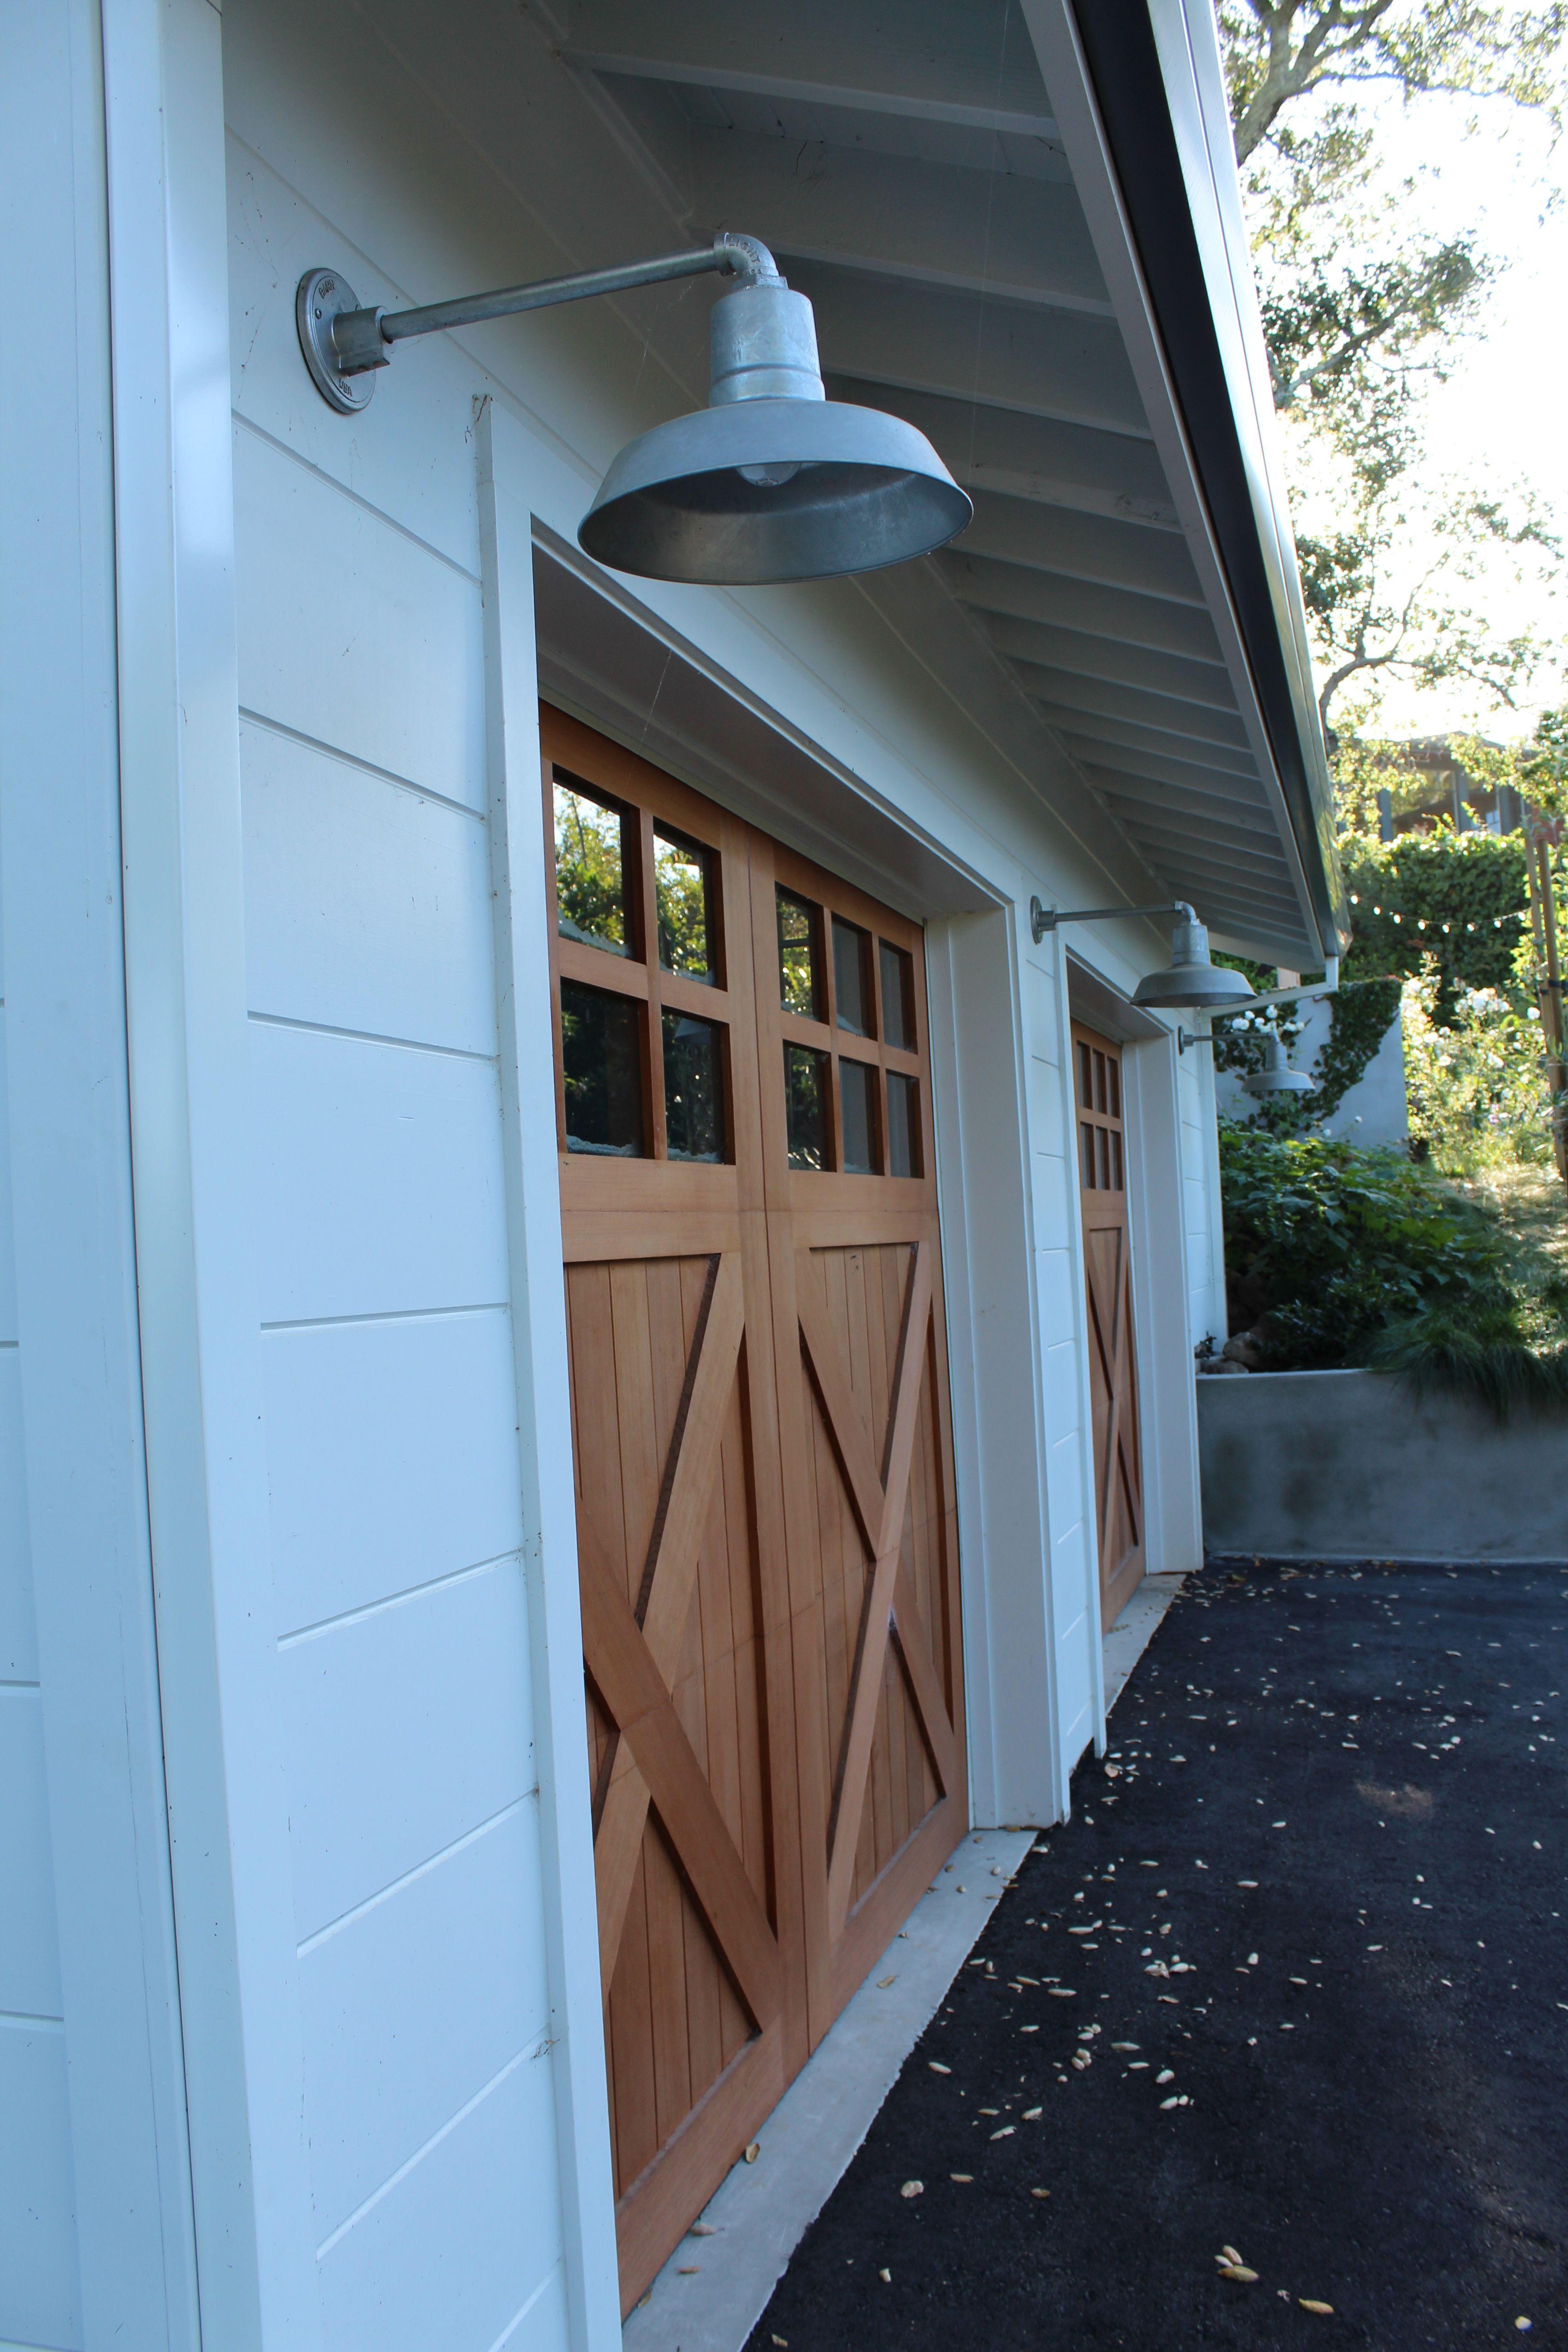 Vintage timber frame barn addition farmhouse exterior burlington - Galvanized Goes With Garages Outdoor Lights